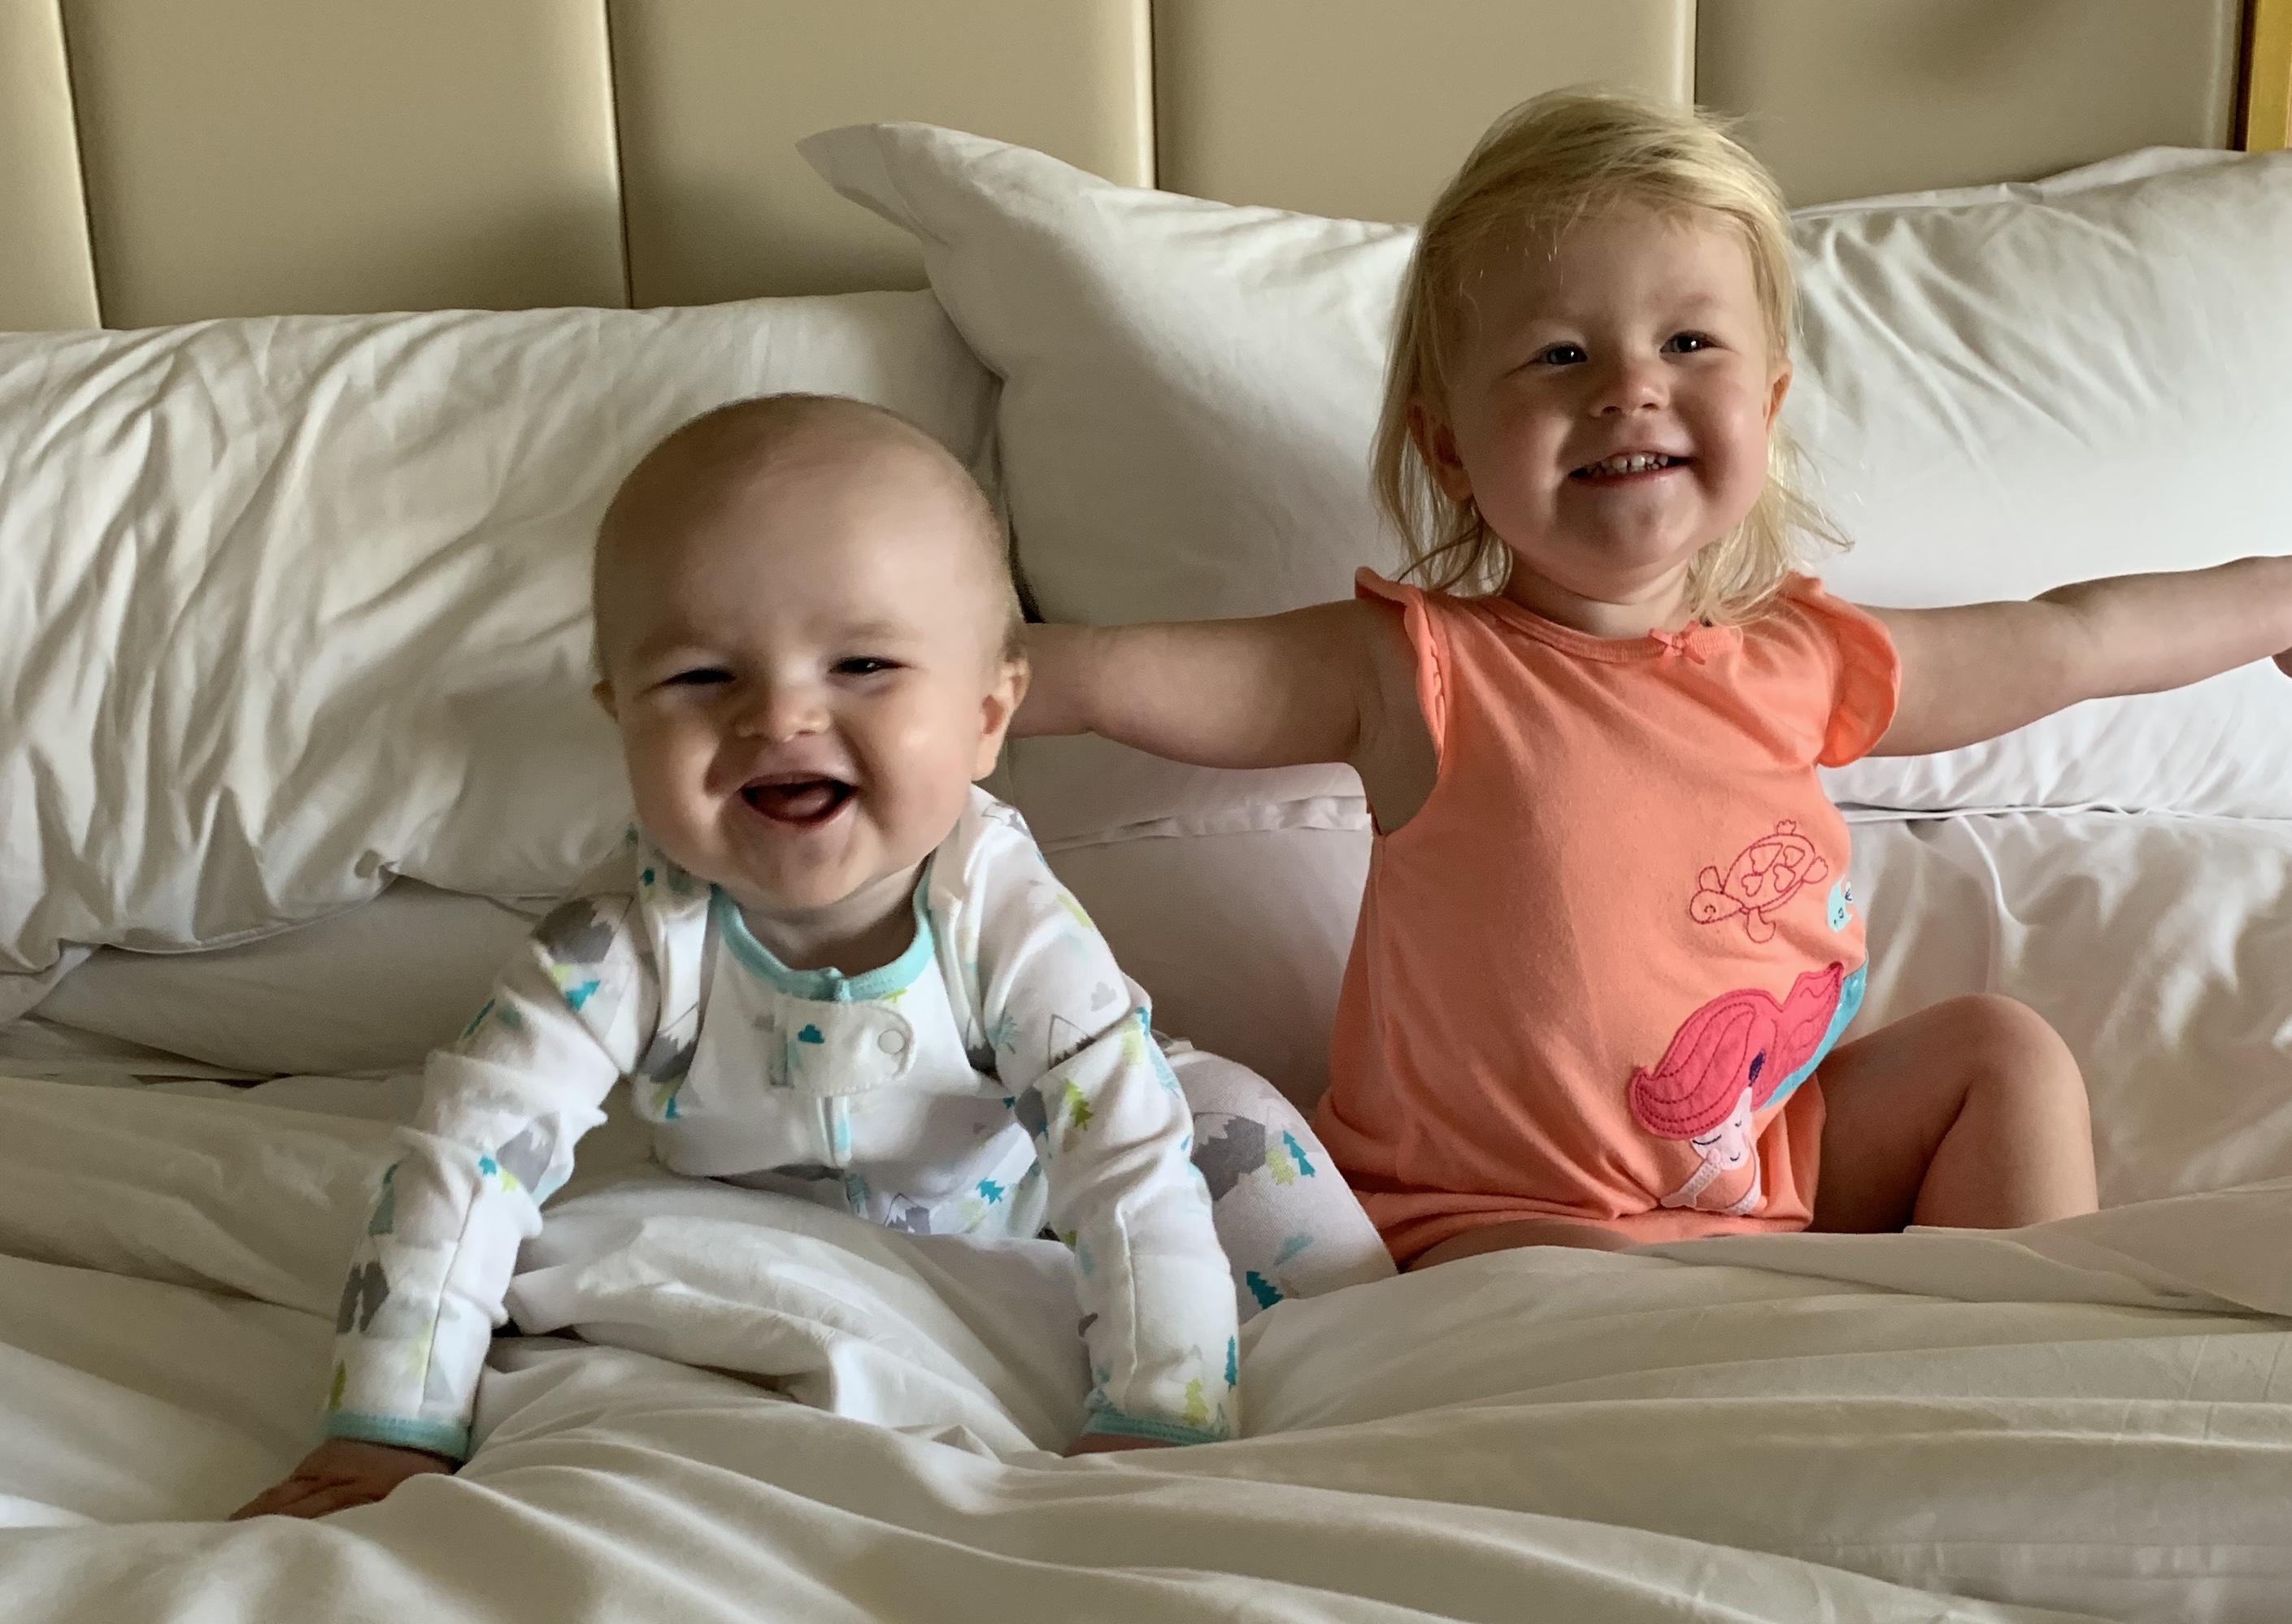 Trump Doral: A Luxurious Family Friendly Getaway miami moms blog